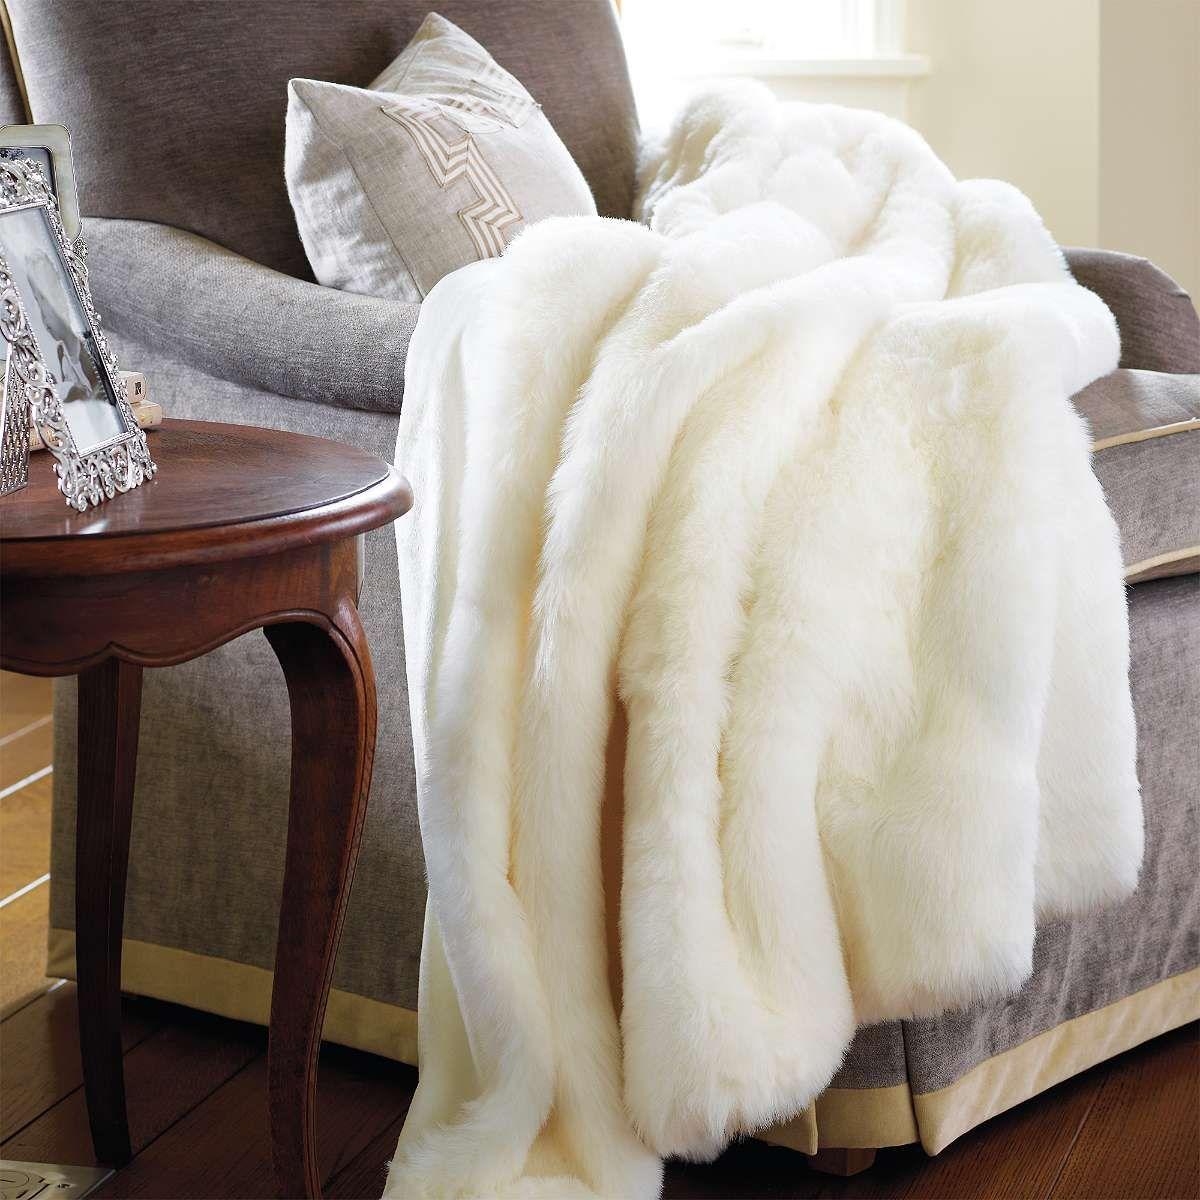 Frontgate Luxury Faux Fur Throw Dekorativnye Podushki Interer